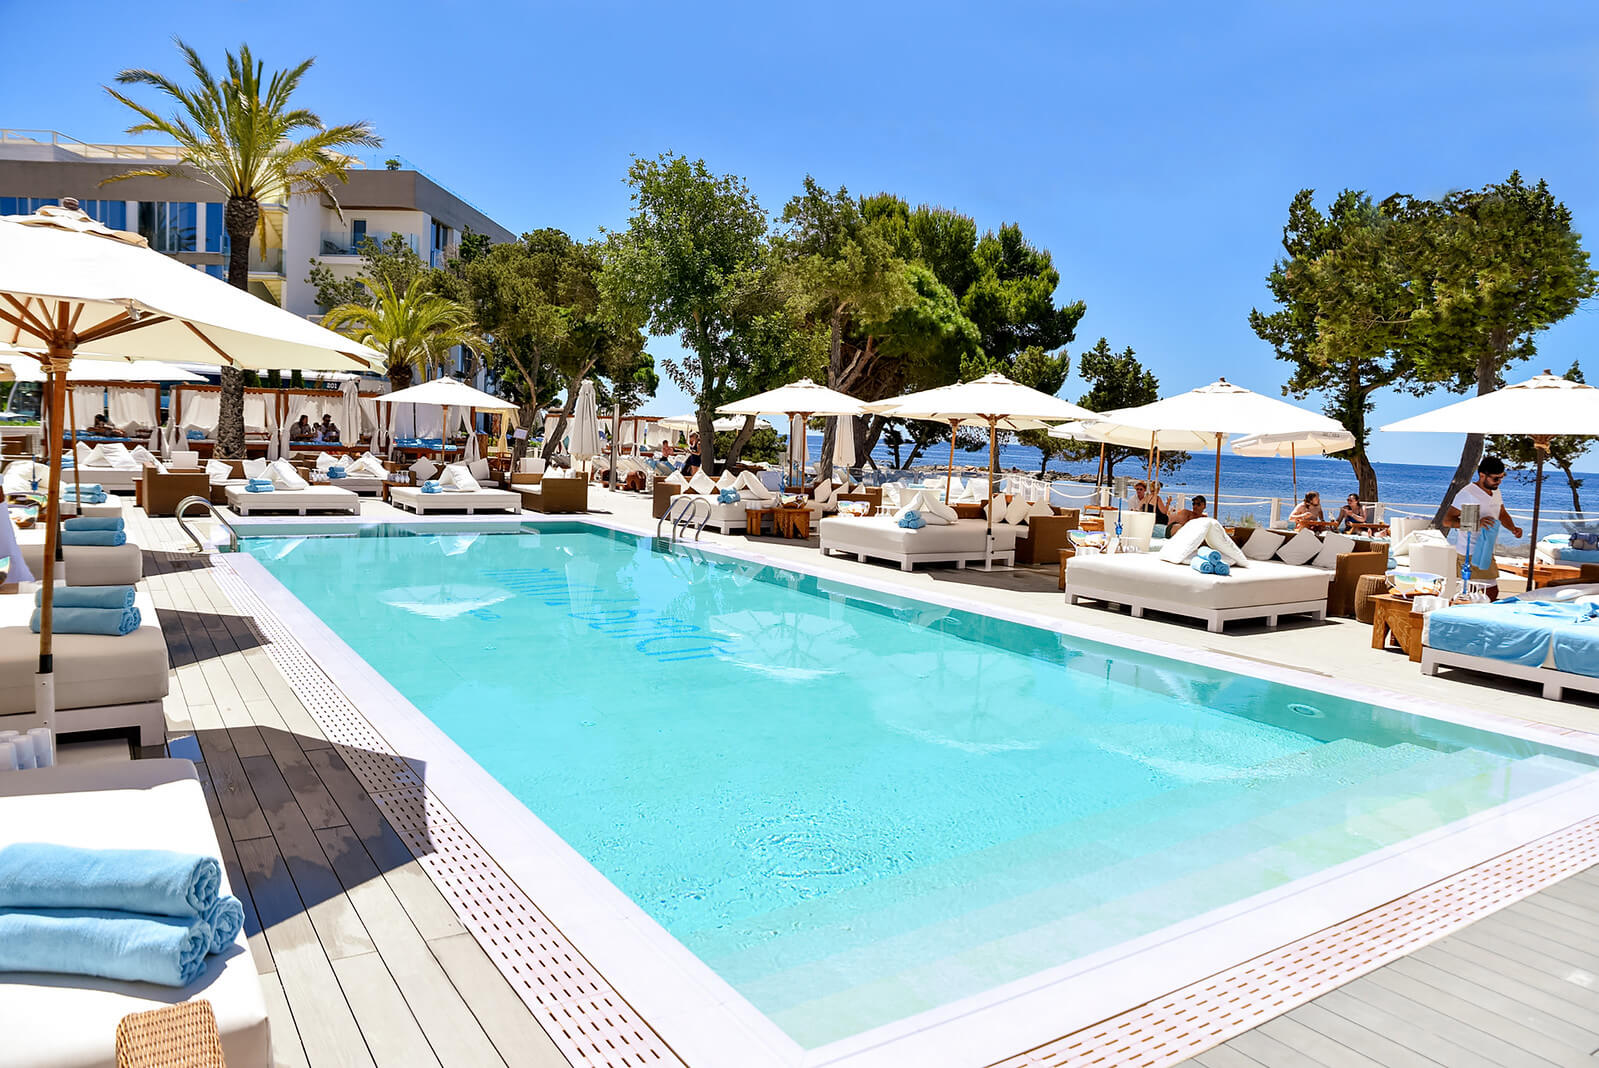 https://www.white-ibiza.com/wp-content/uploads/2020/03/white-ibiza-restaurants-nikki-beach-ibiza-2020-05.jpg